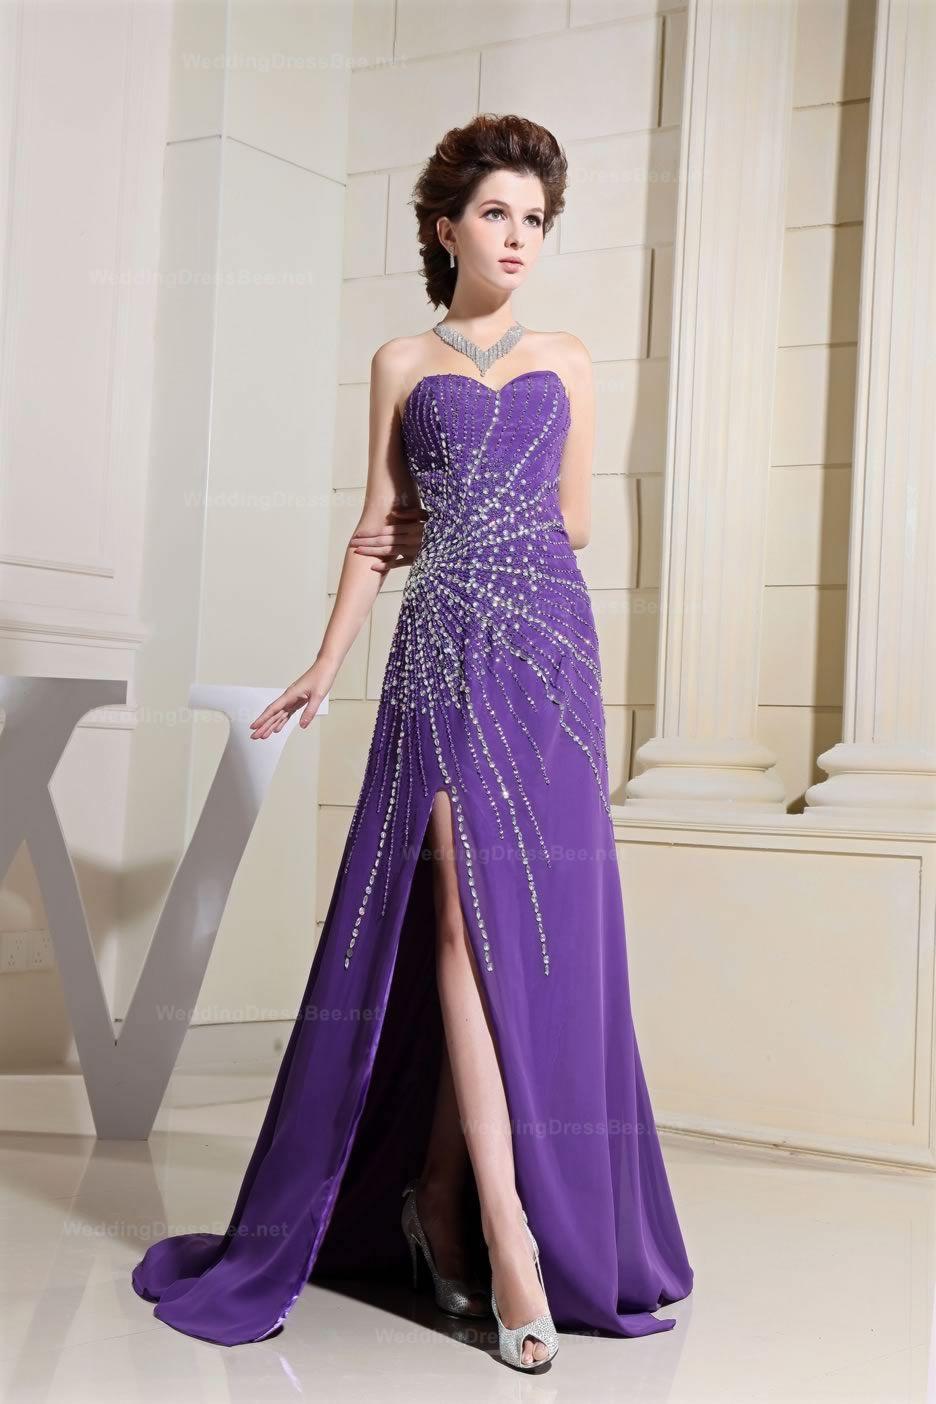 Style No.0sp00607,Sexy Thigh-High Split Chiffon Dress,US$238.98 ...